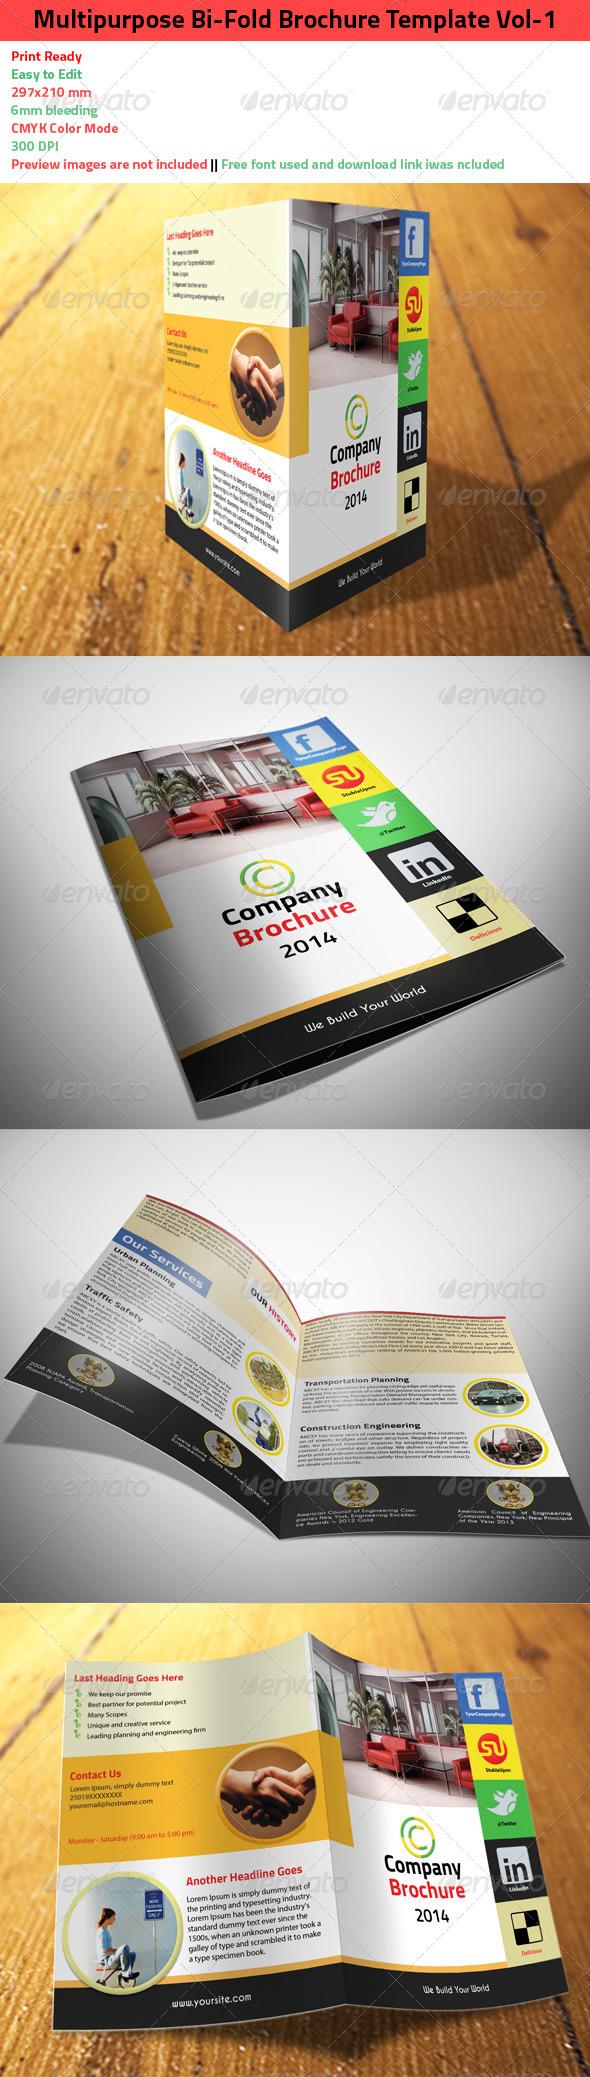 Multipurpose Bi-Fold Brochure Template Vol-1 - Corporate Brochures